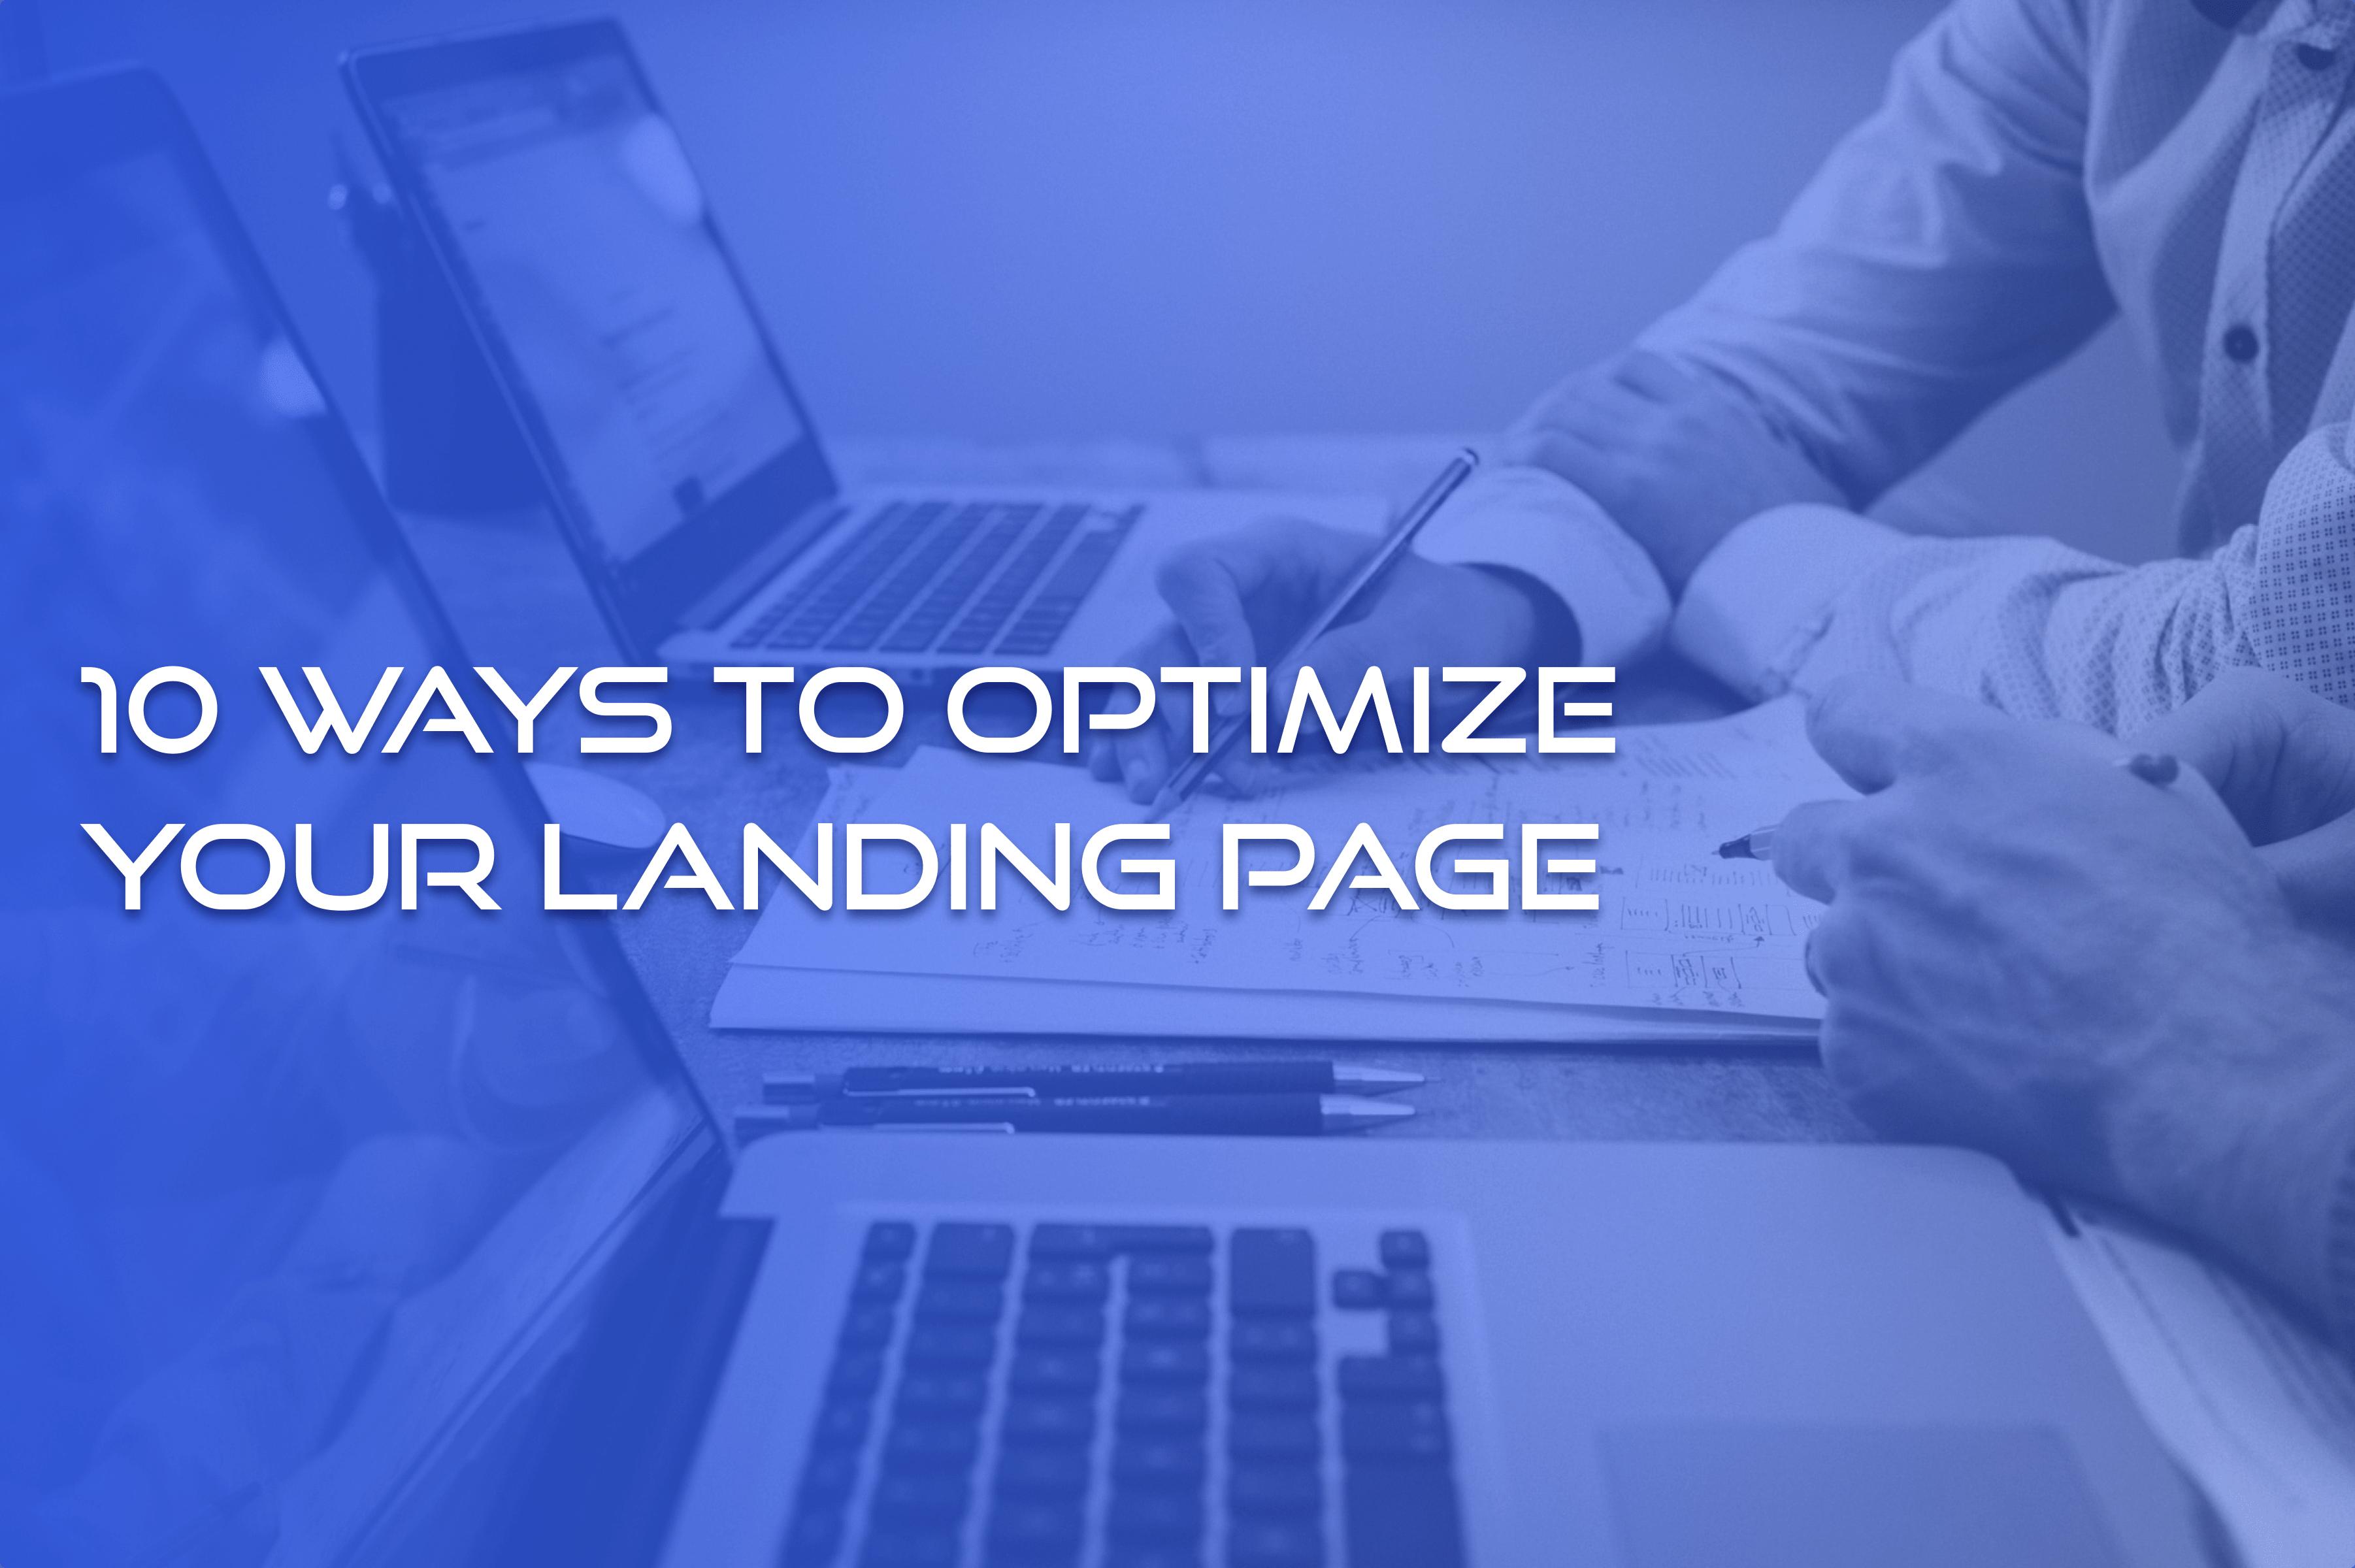 lead generation landing page best practices